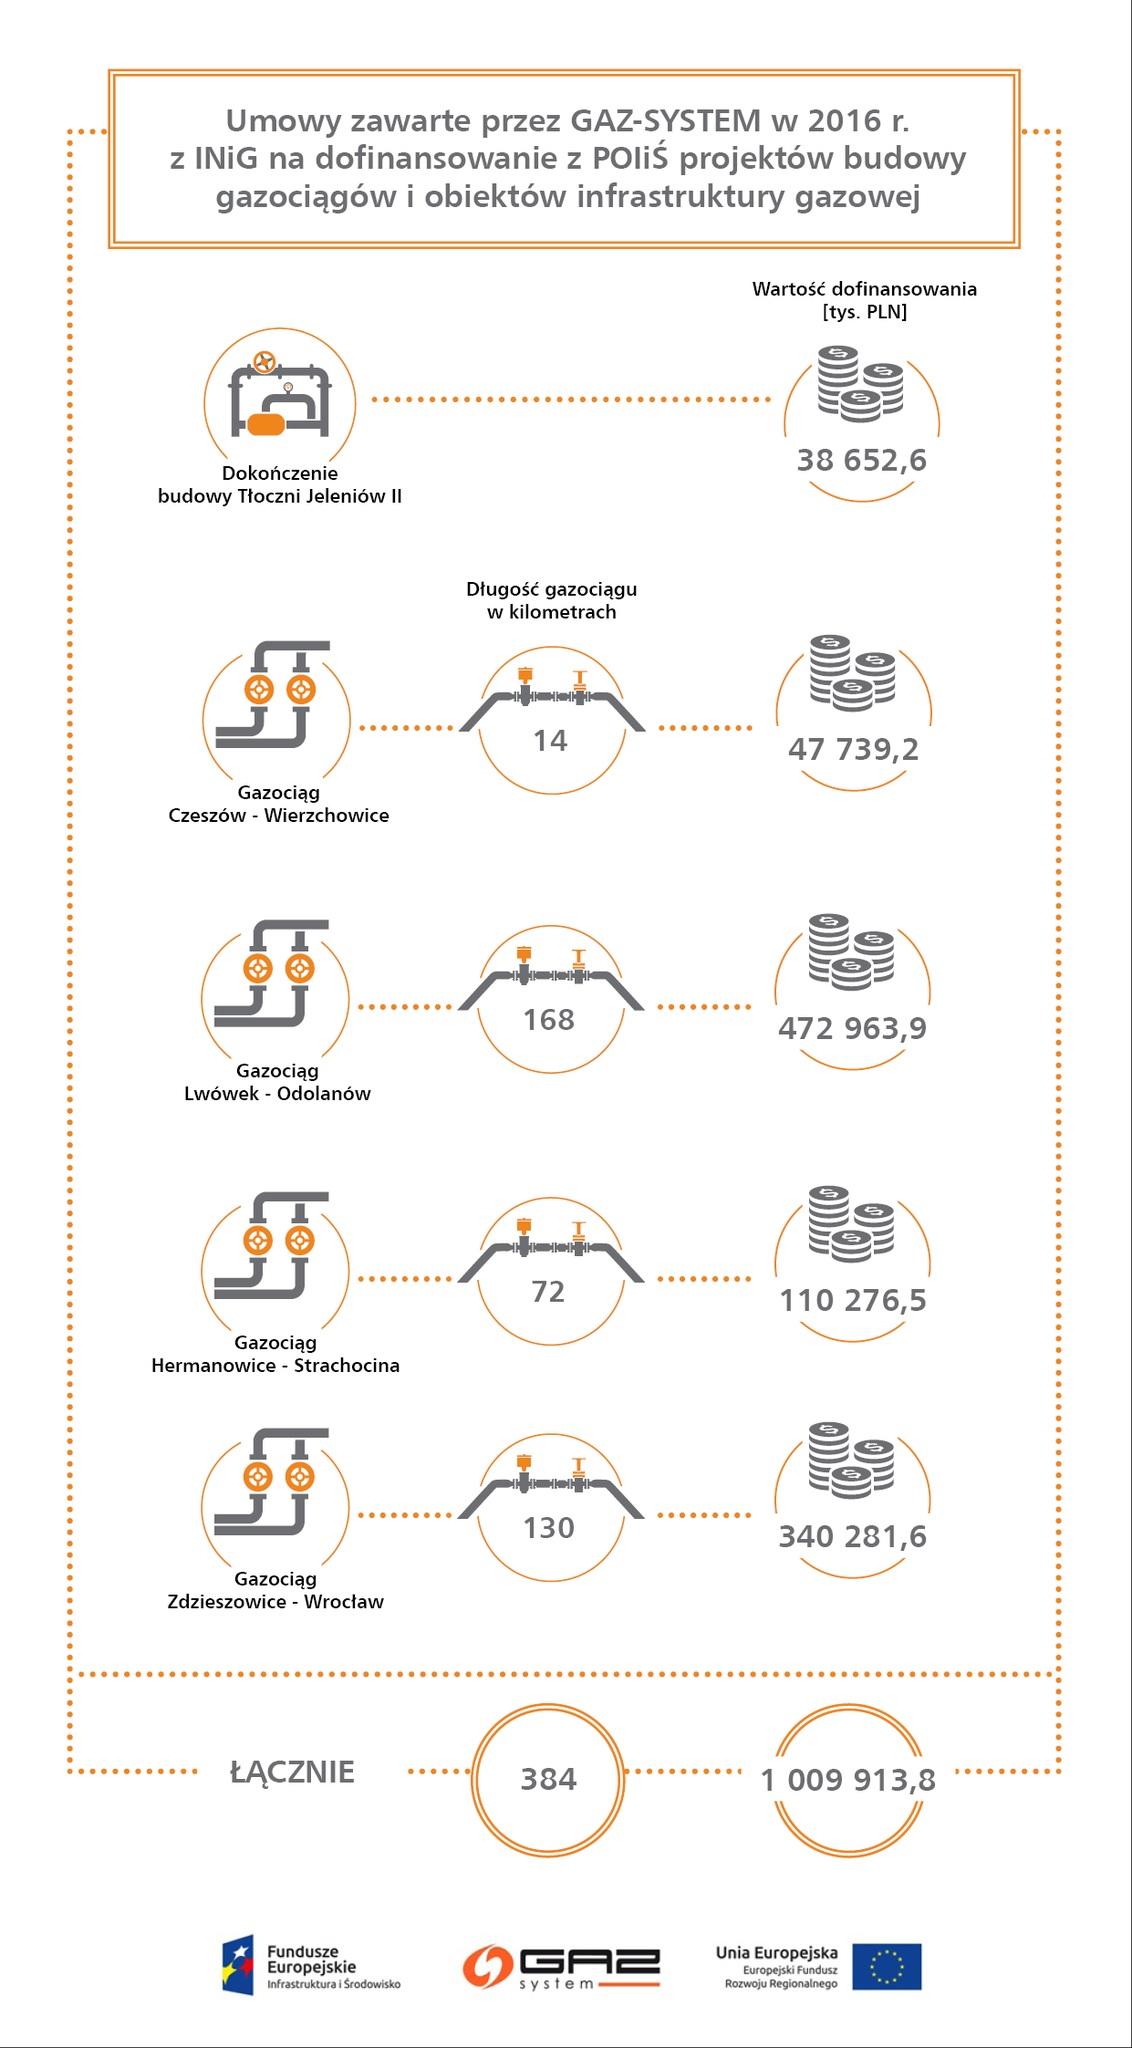 gaz-system-2016-poiis